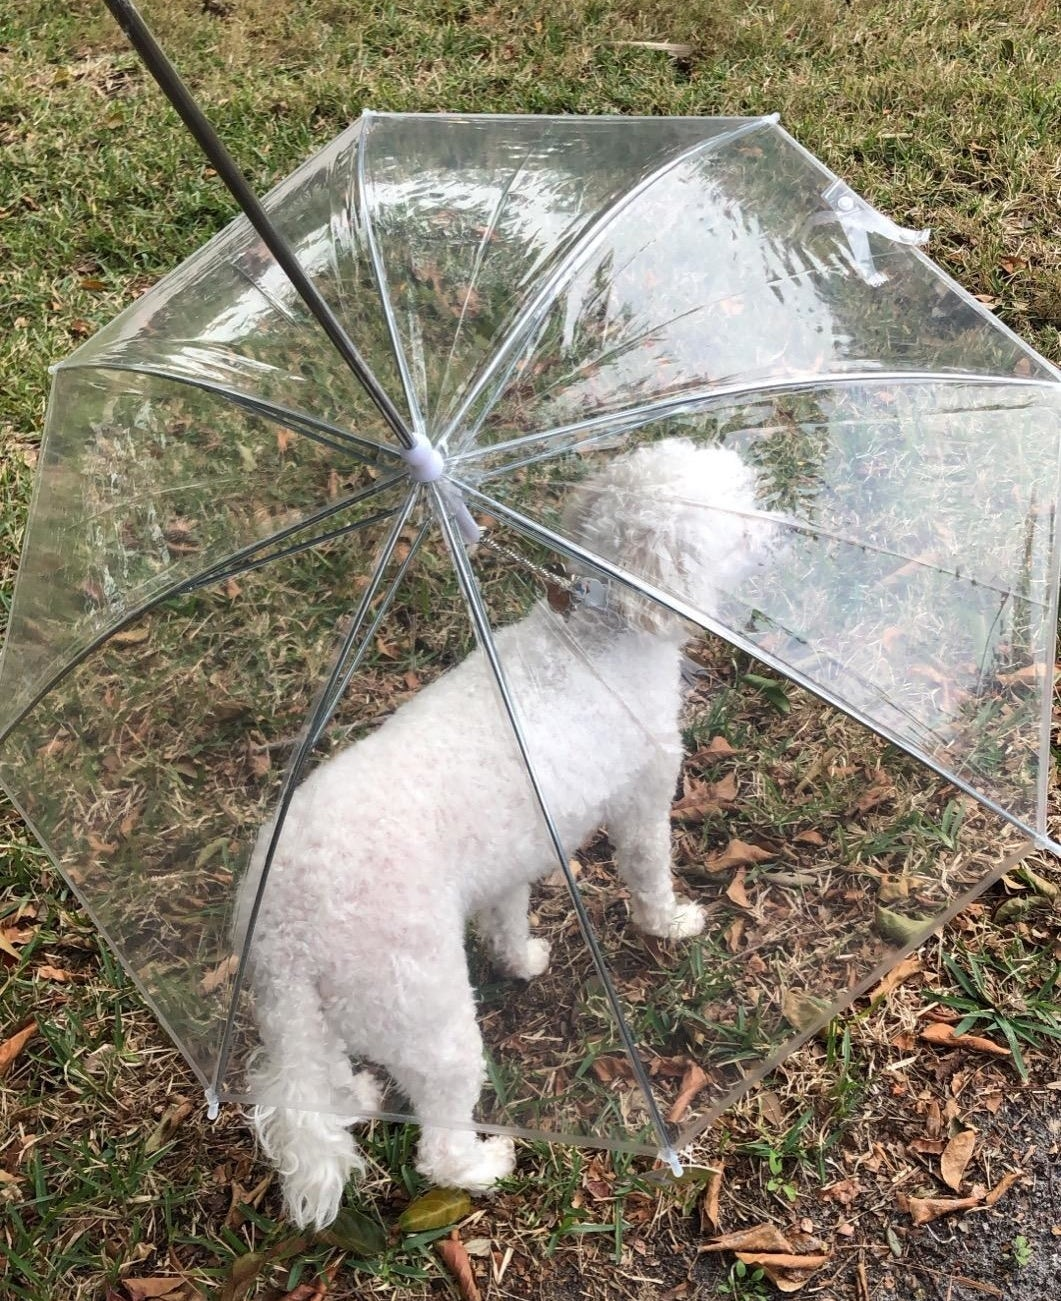 A reviewer's dog under the transparent leash umbrella